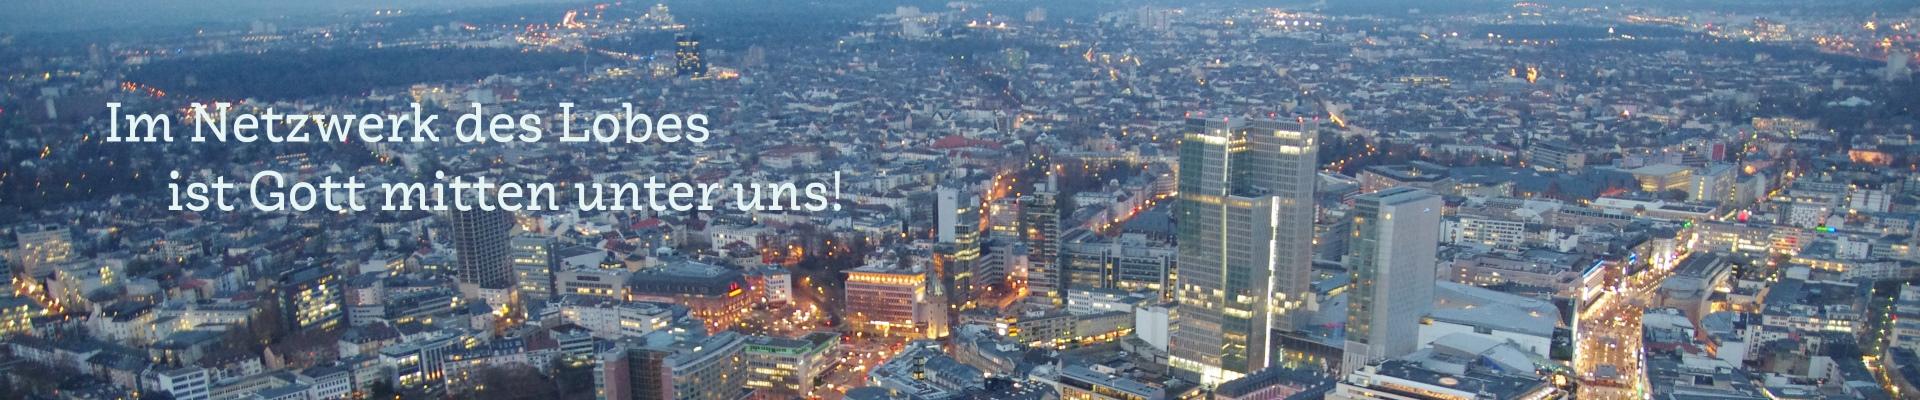 Netzwerkdeslobes-banner-1920x400